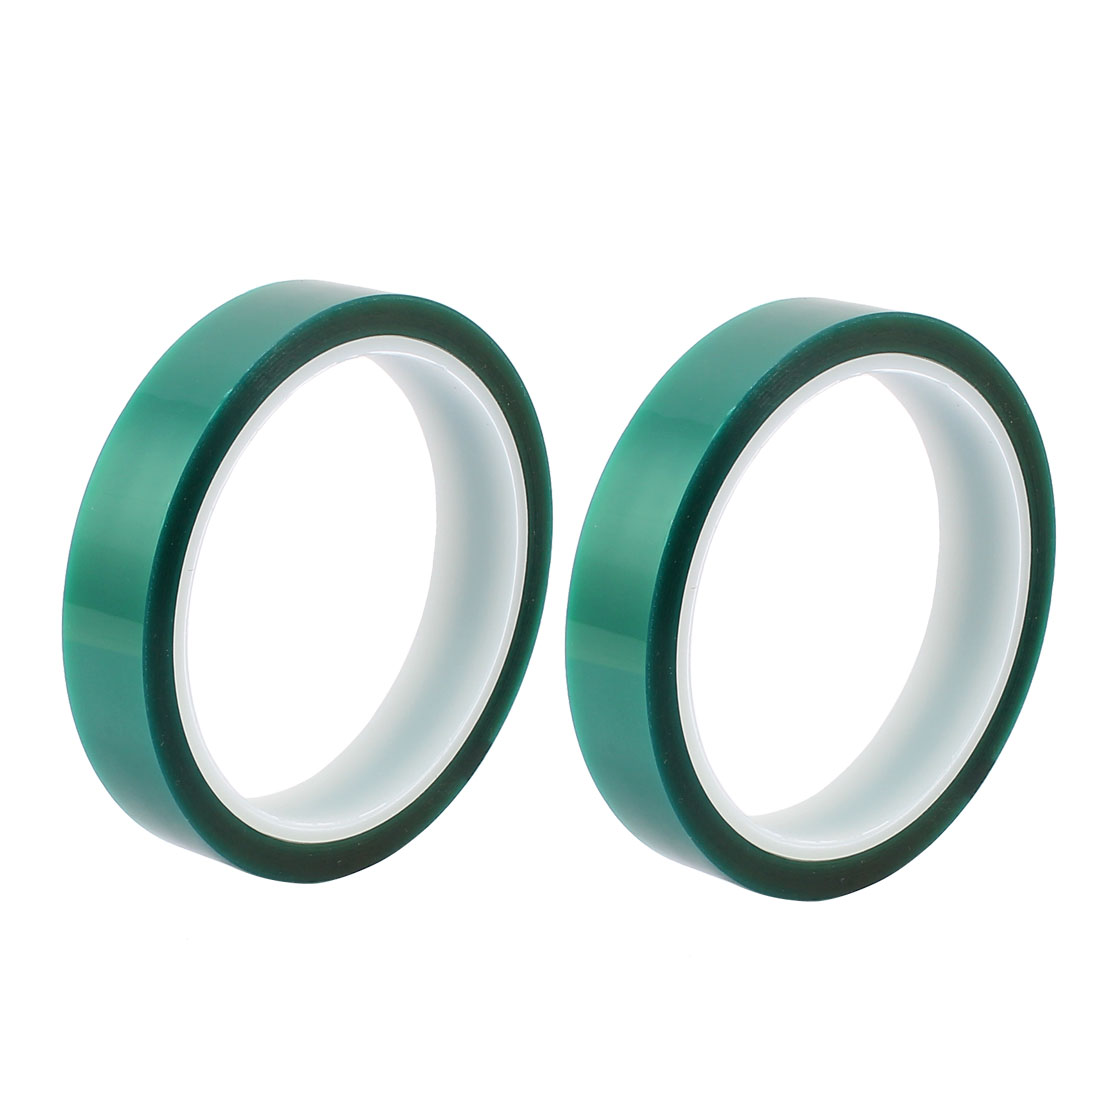 2pcs 18mm Width 33M Long Green PET High Temperature Heat Resistant PCB Solder Tape